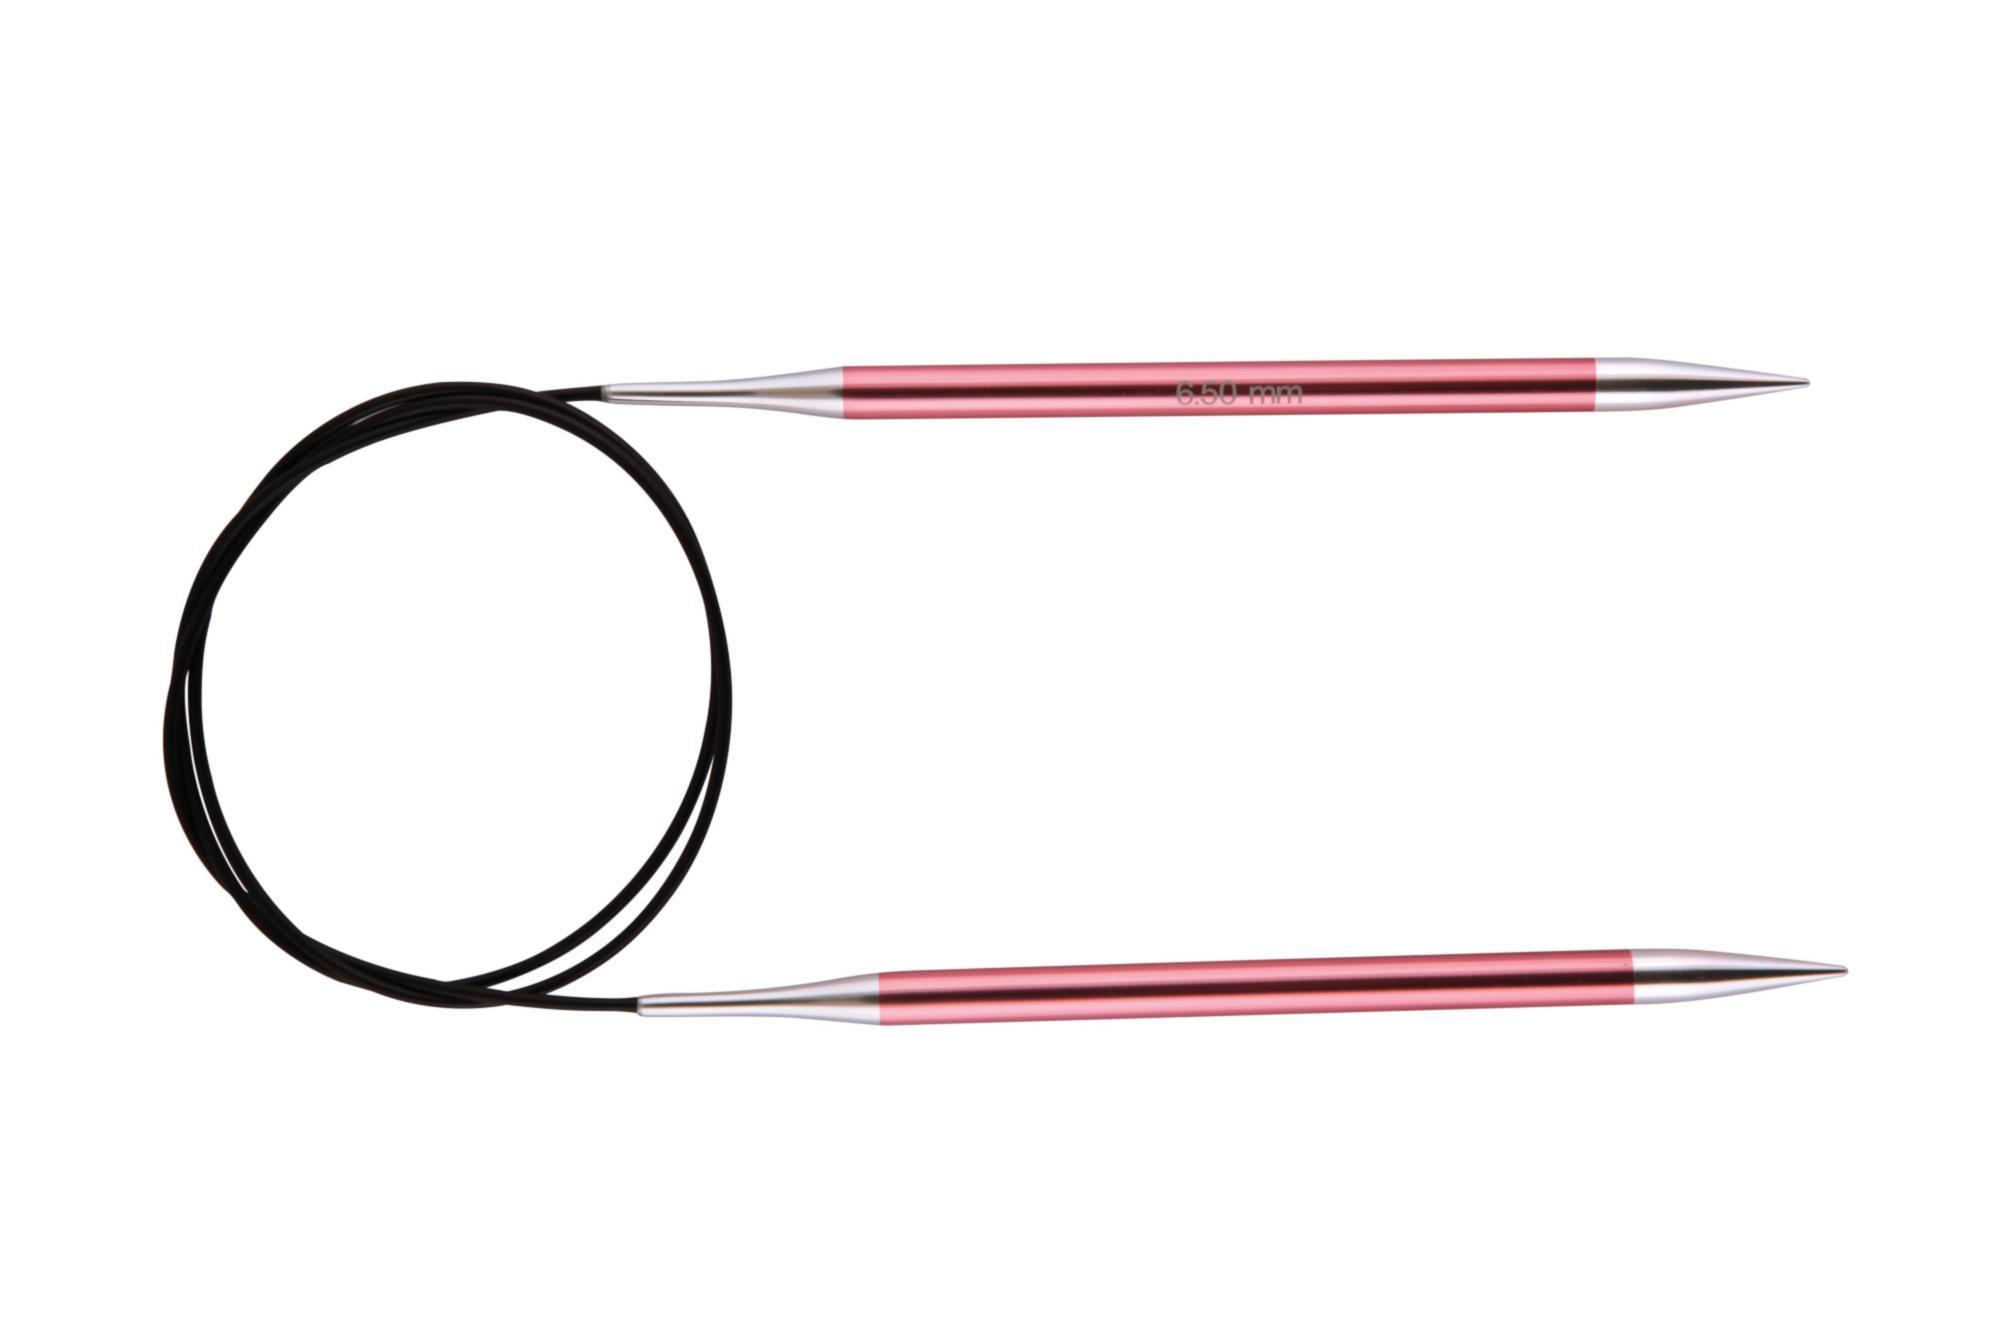 Спицы круговые 80 см Zing KnitPro, 47134, 6.50 мм